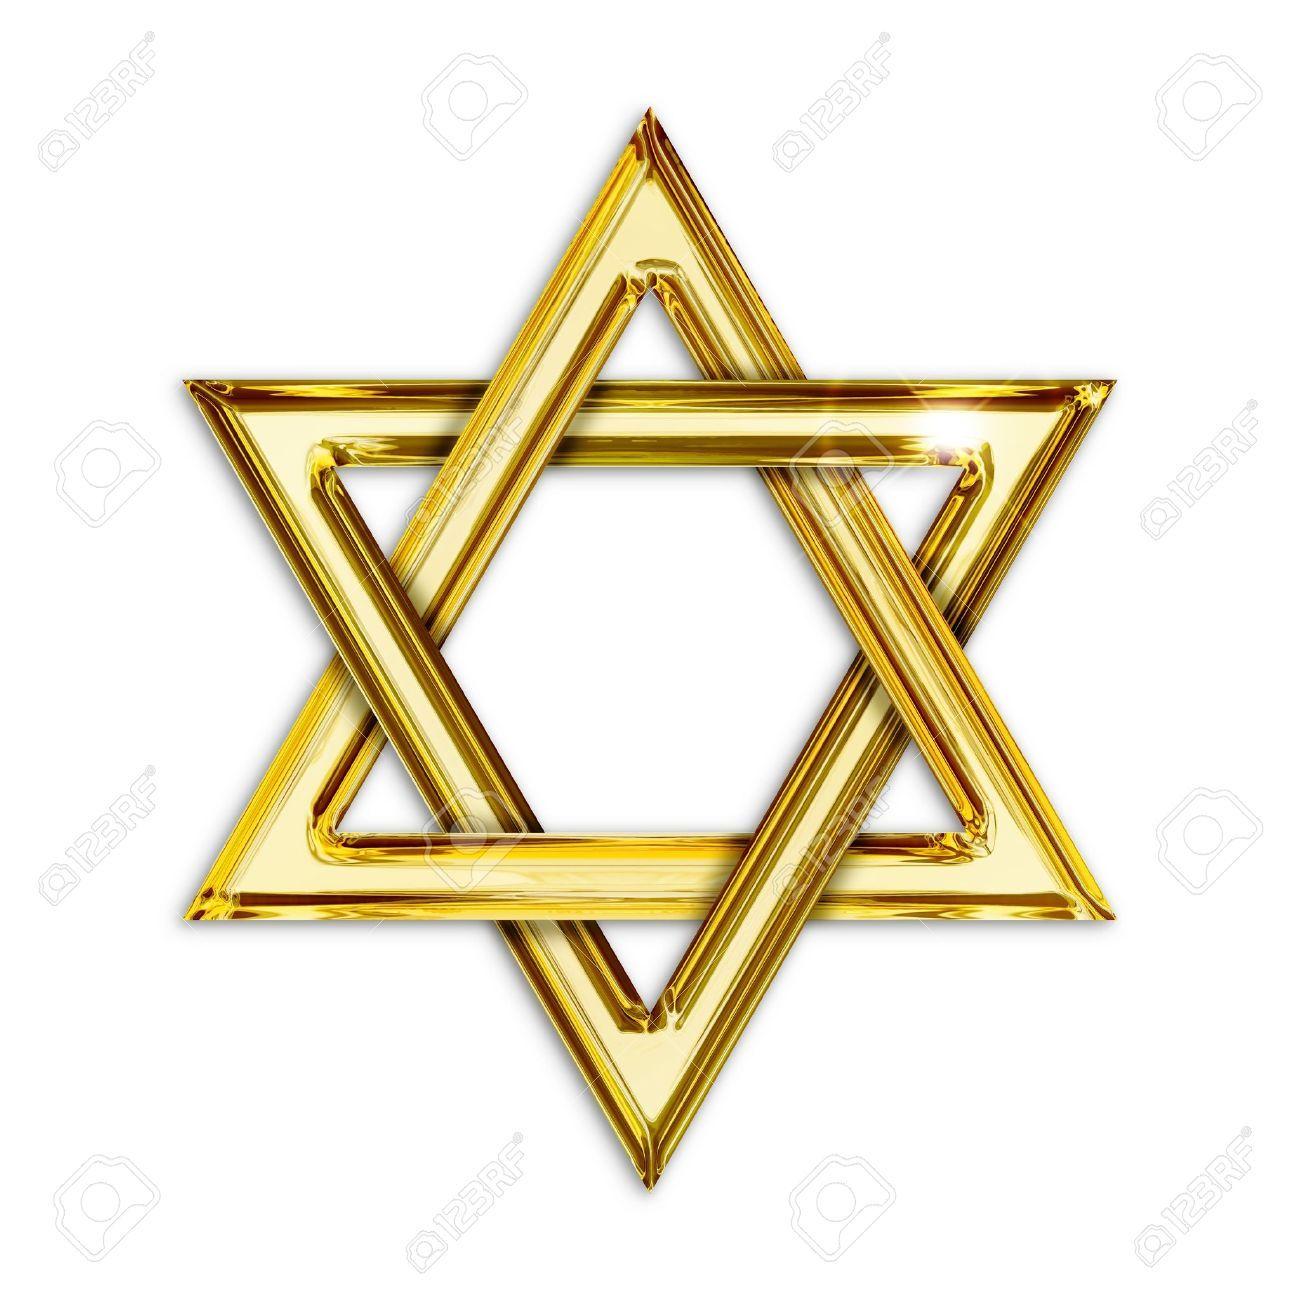 19601053 Illustration Of Golden Hexagram On White Background Stock Illustration Jpg 1300 1300 Estrella De David Tarjeta Empresa Estrellas